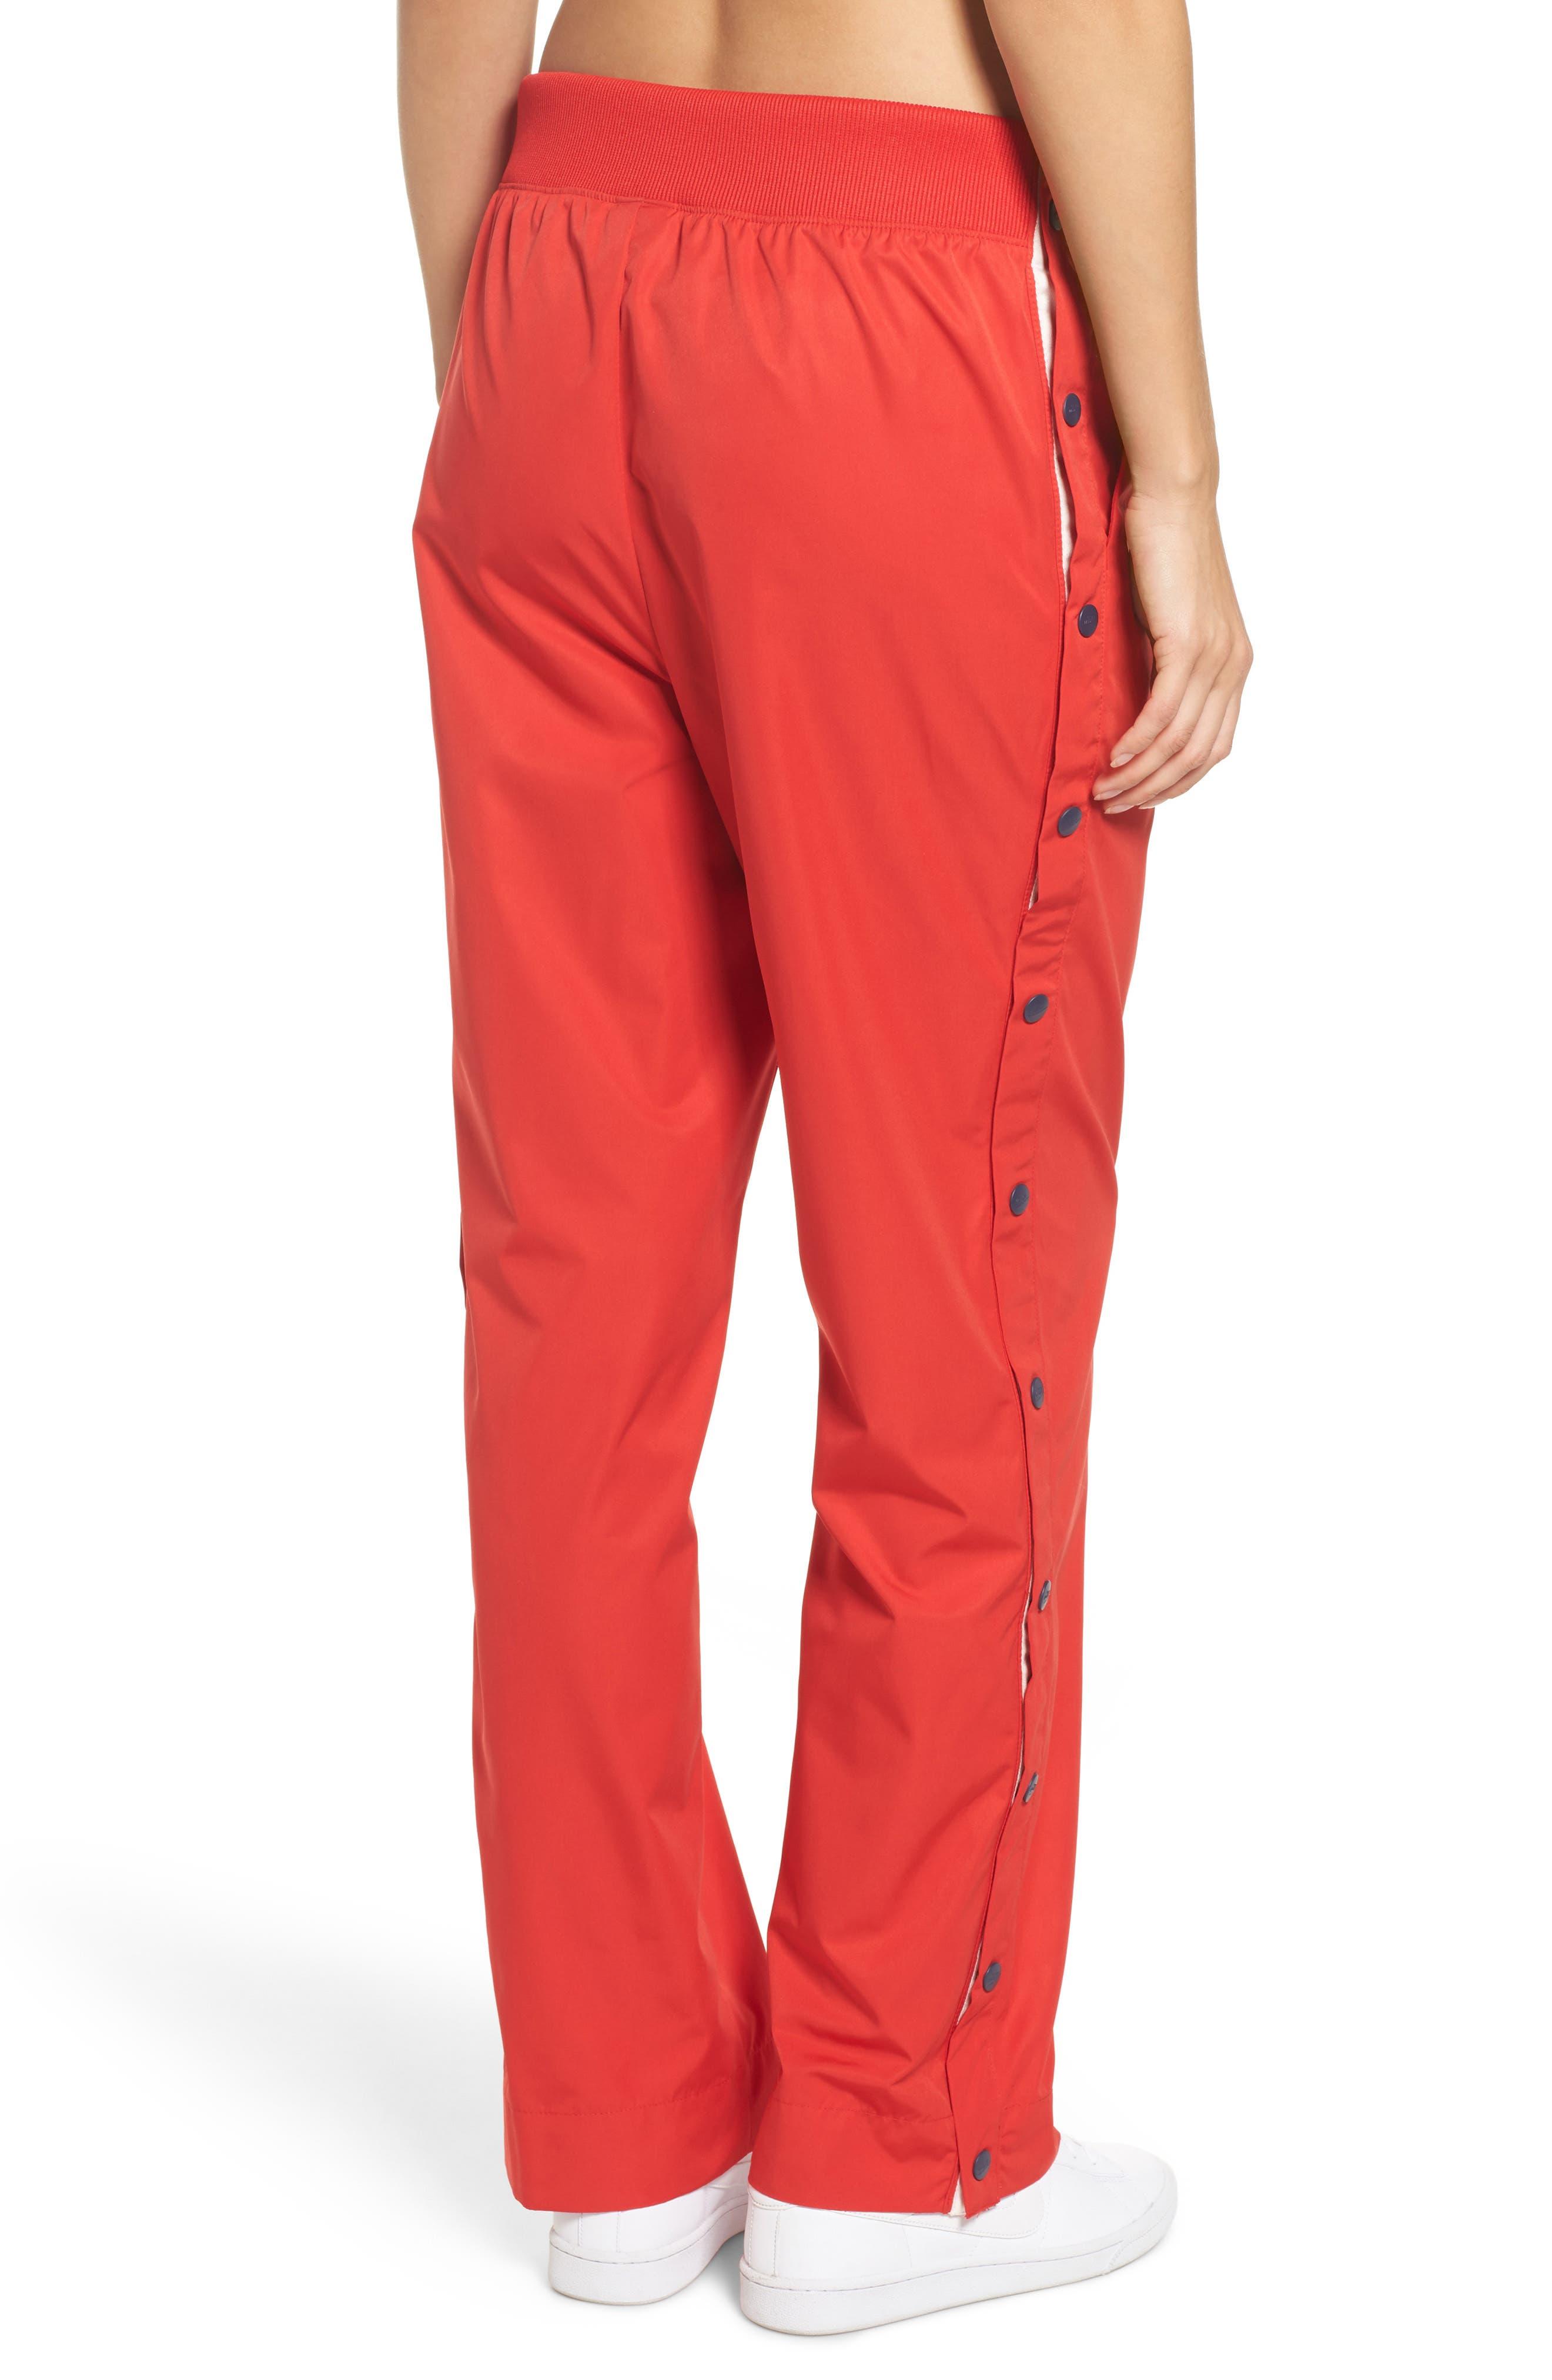 Sportswear Archive Snap Track Pants,                             Alternate thumbnail 2, color,                             University Red/ Thunder Blue